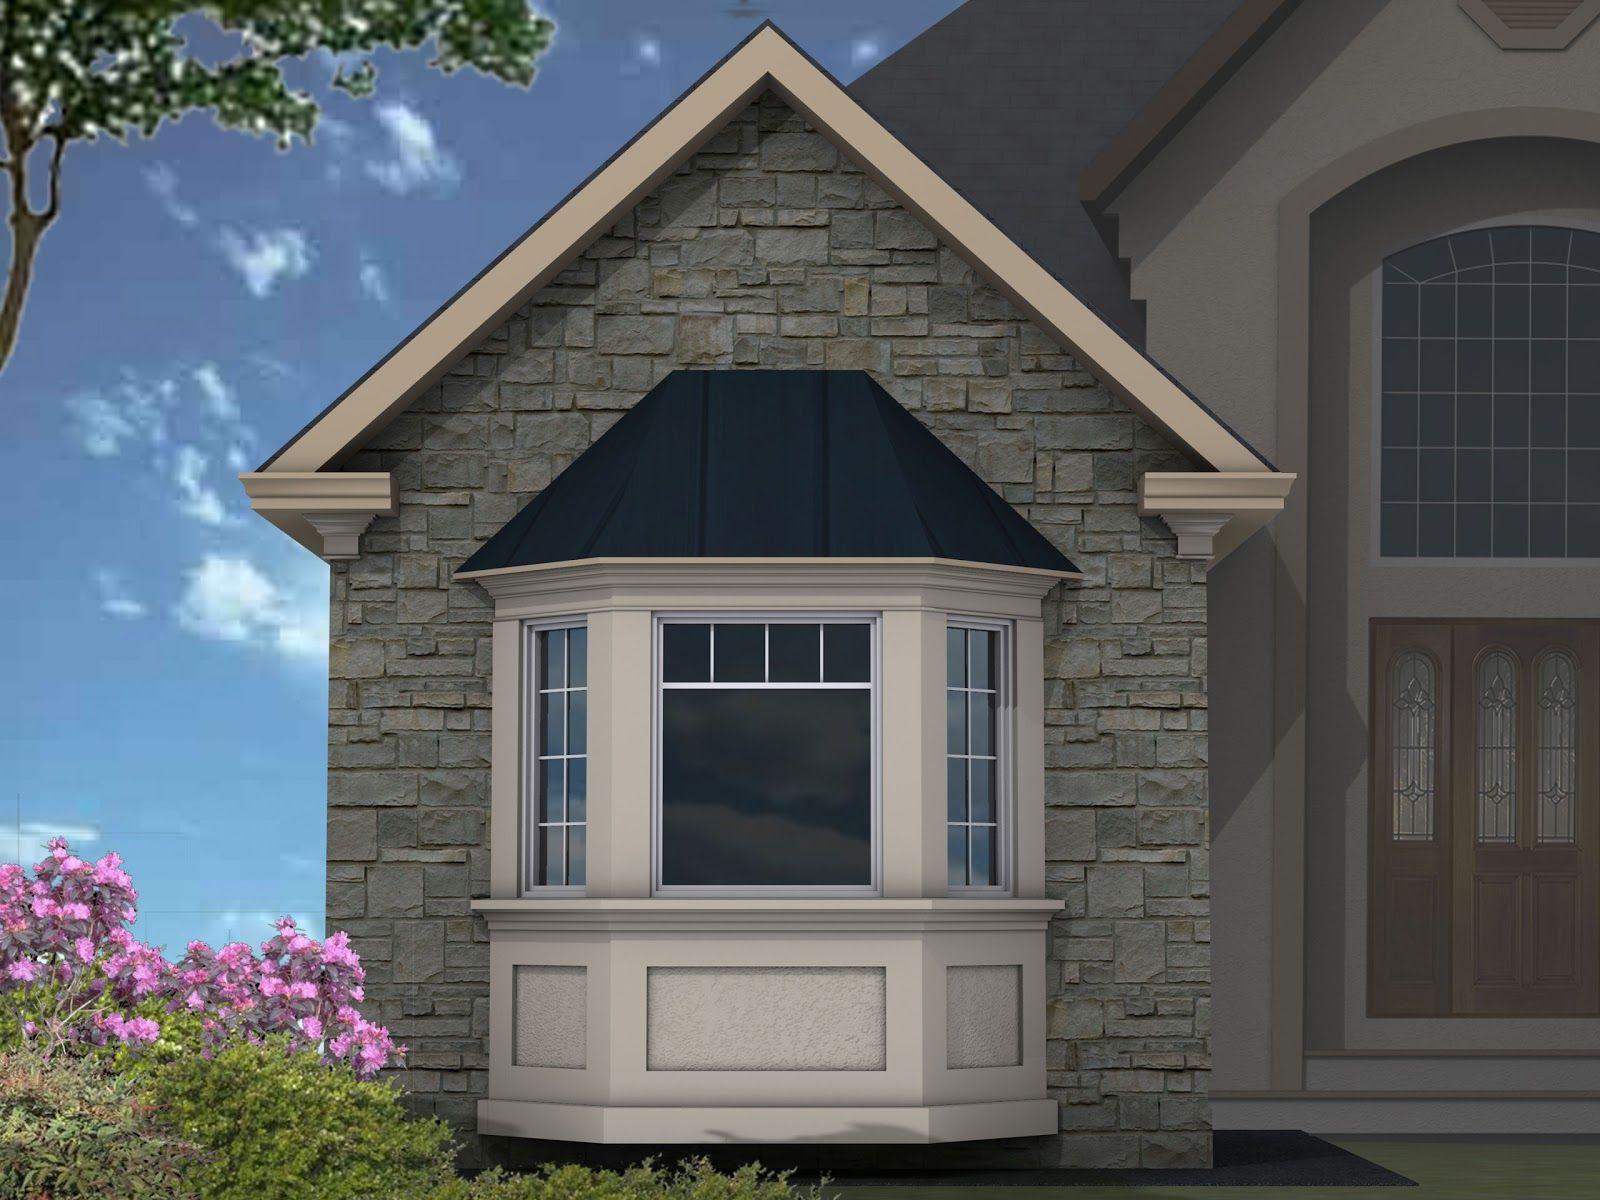 Exterior window cornice ideas - Exterior House Trim 20 Astonishing Wood Windows Exterior Wood Window Trim Ideas